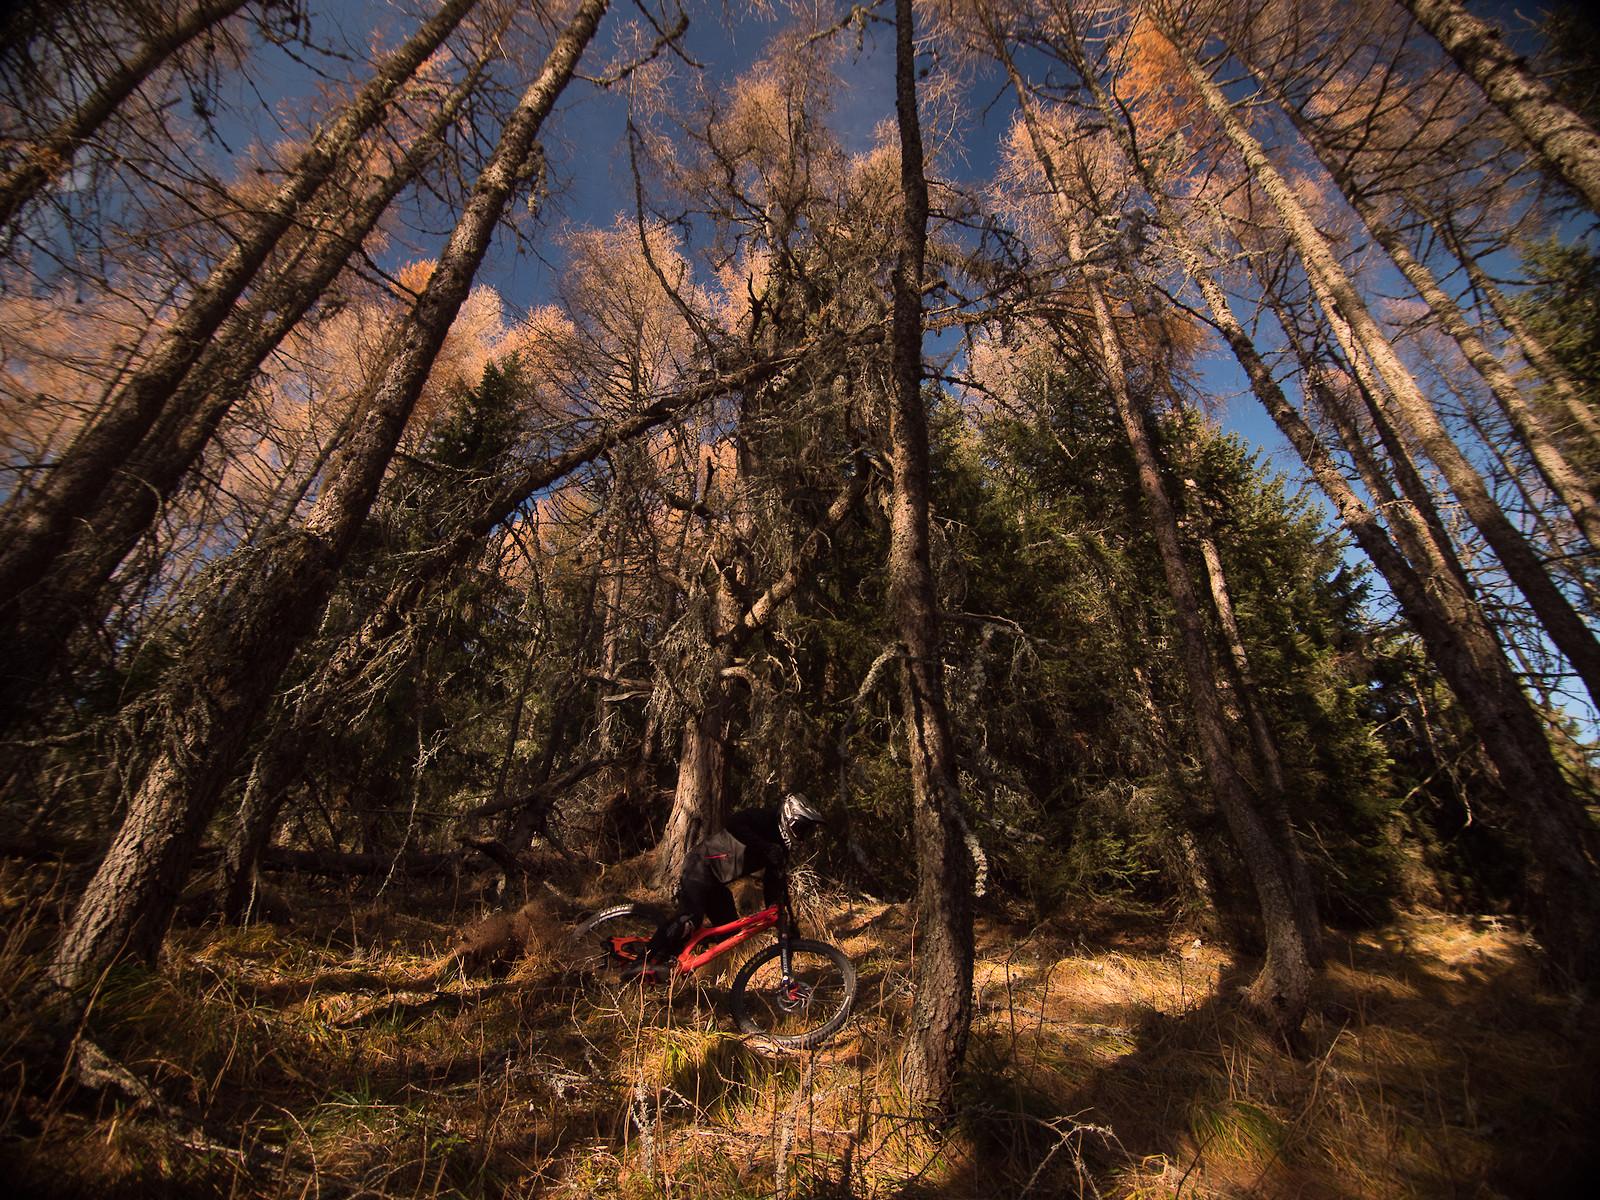 Pure Nature - EWIA - Mountain Biking Pictures - Vital MTB